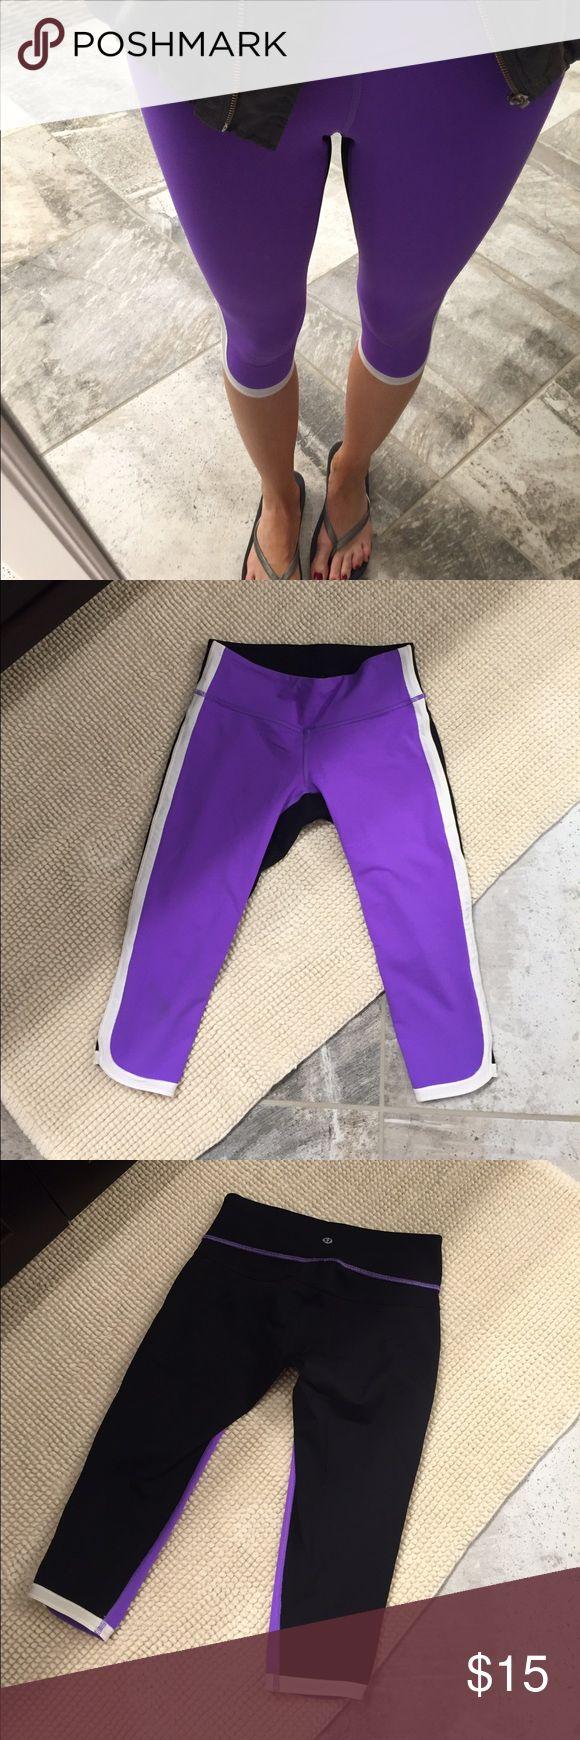 Lululemon capri leggings Purple, black and white capri leggings. Very good condition. lululemon athletica Pants Track Pants & Joggers